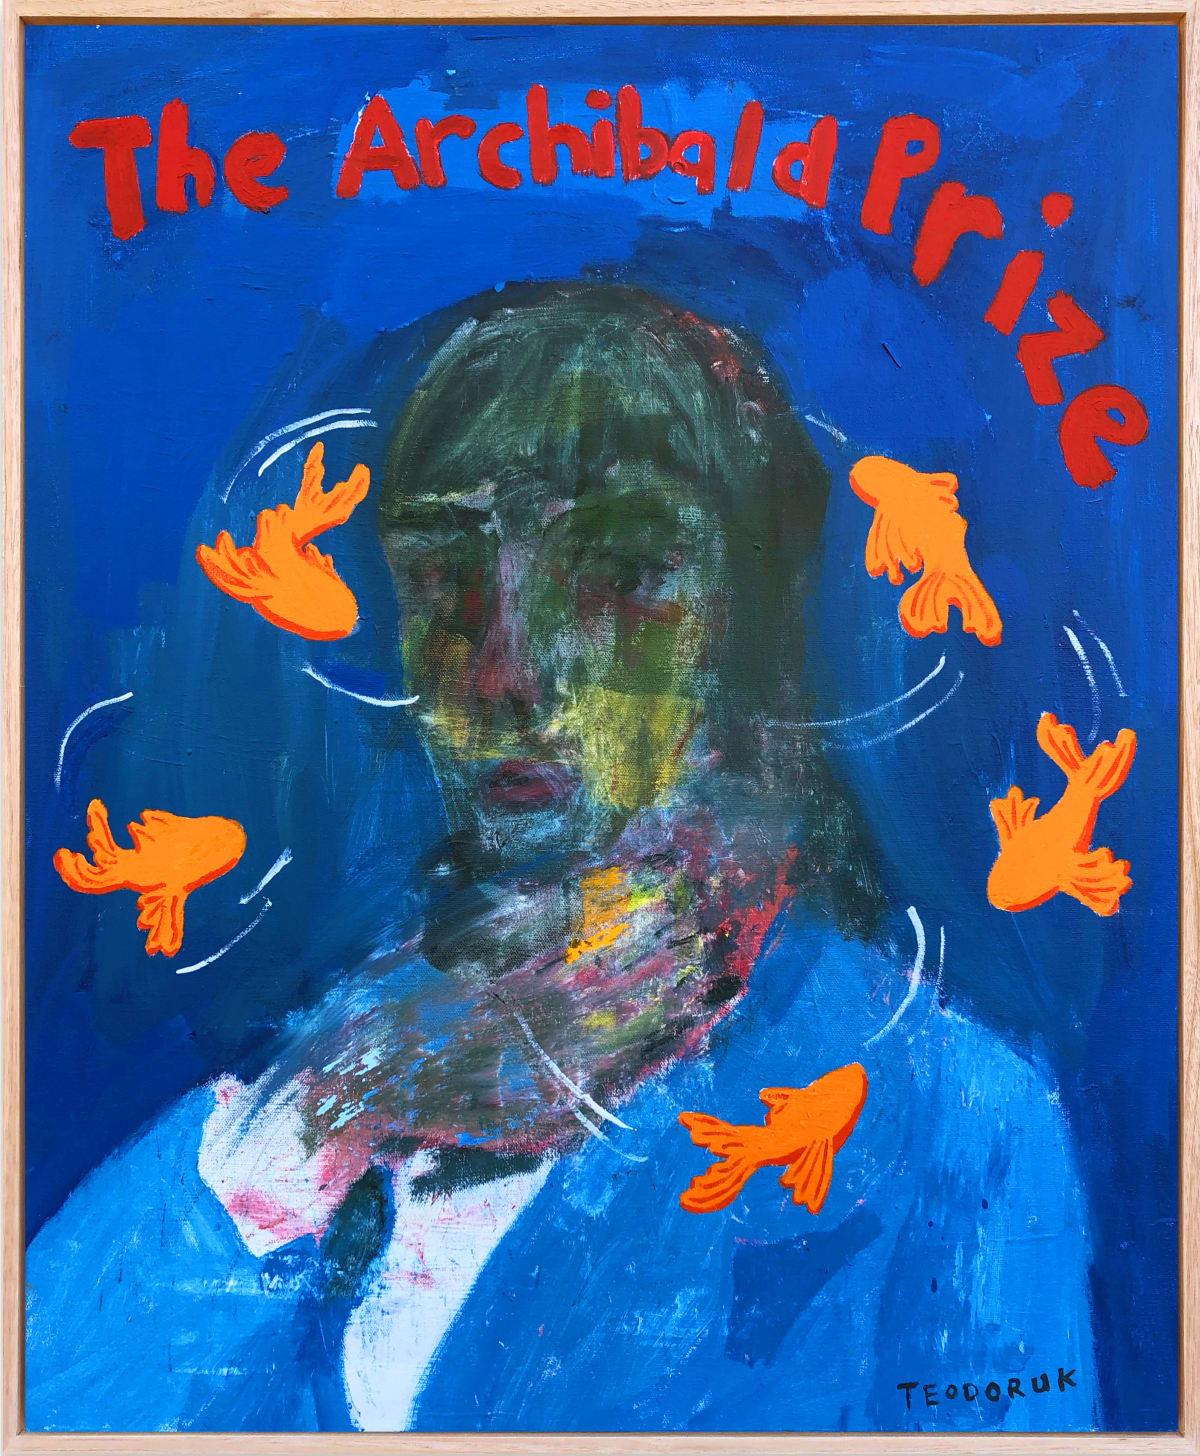 Brad Teodoruk, The Archibald Prize, 2019